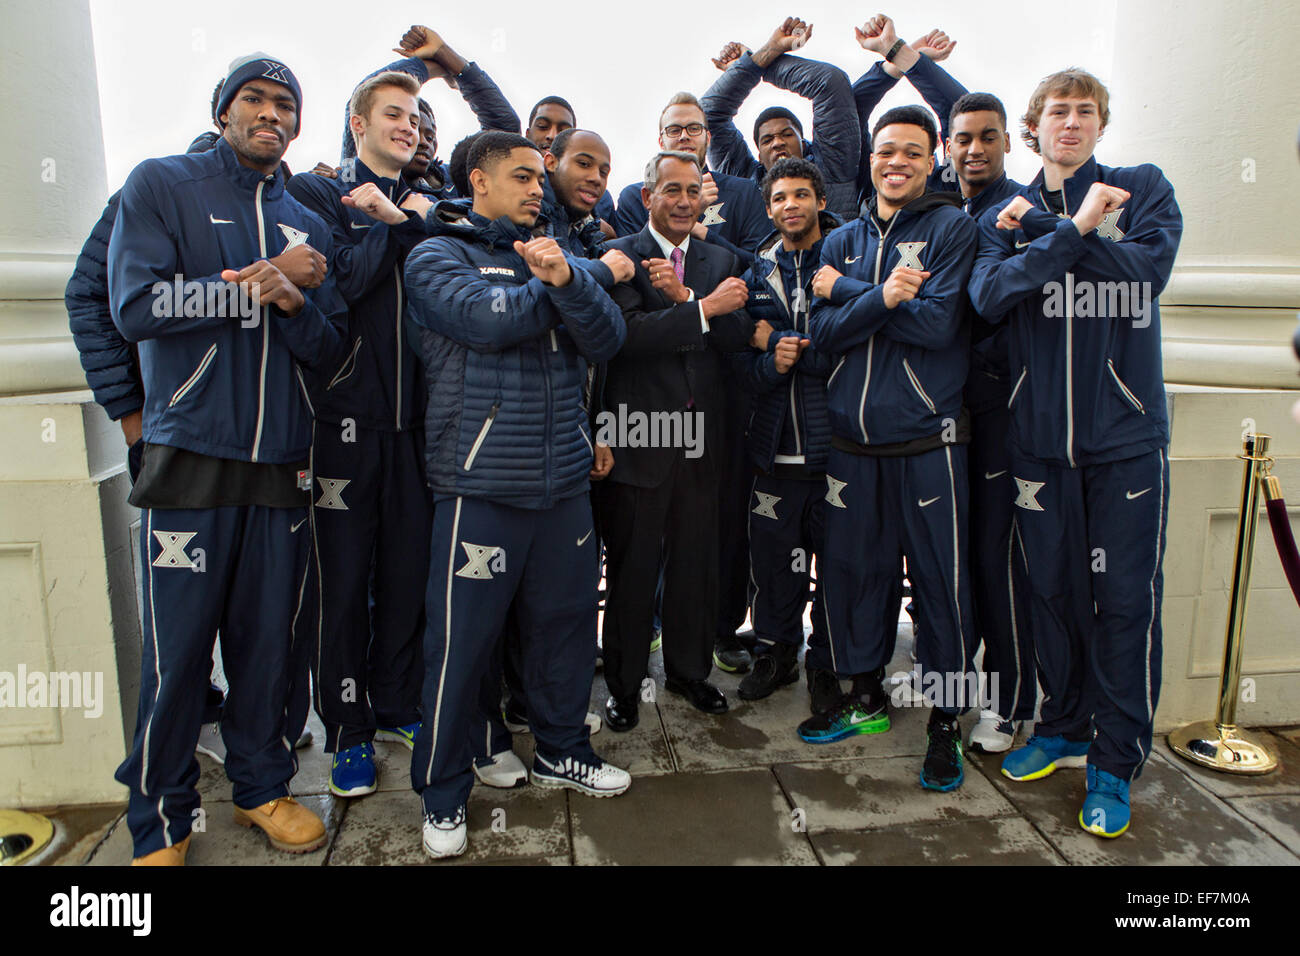 US Speaker of the House John Boehner welcomes the Xavier Men's Basketball team to the U.S. Capitol January 27, 2015 - Stock Image